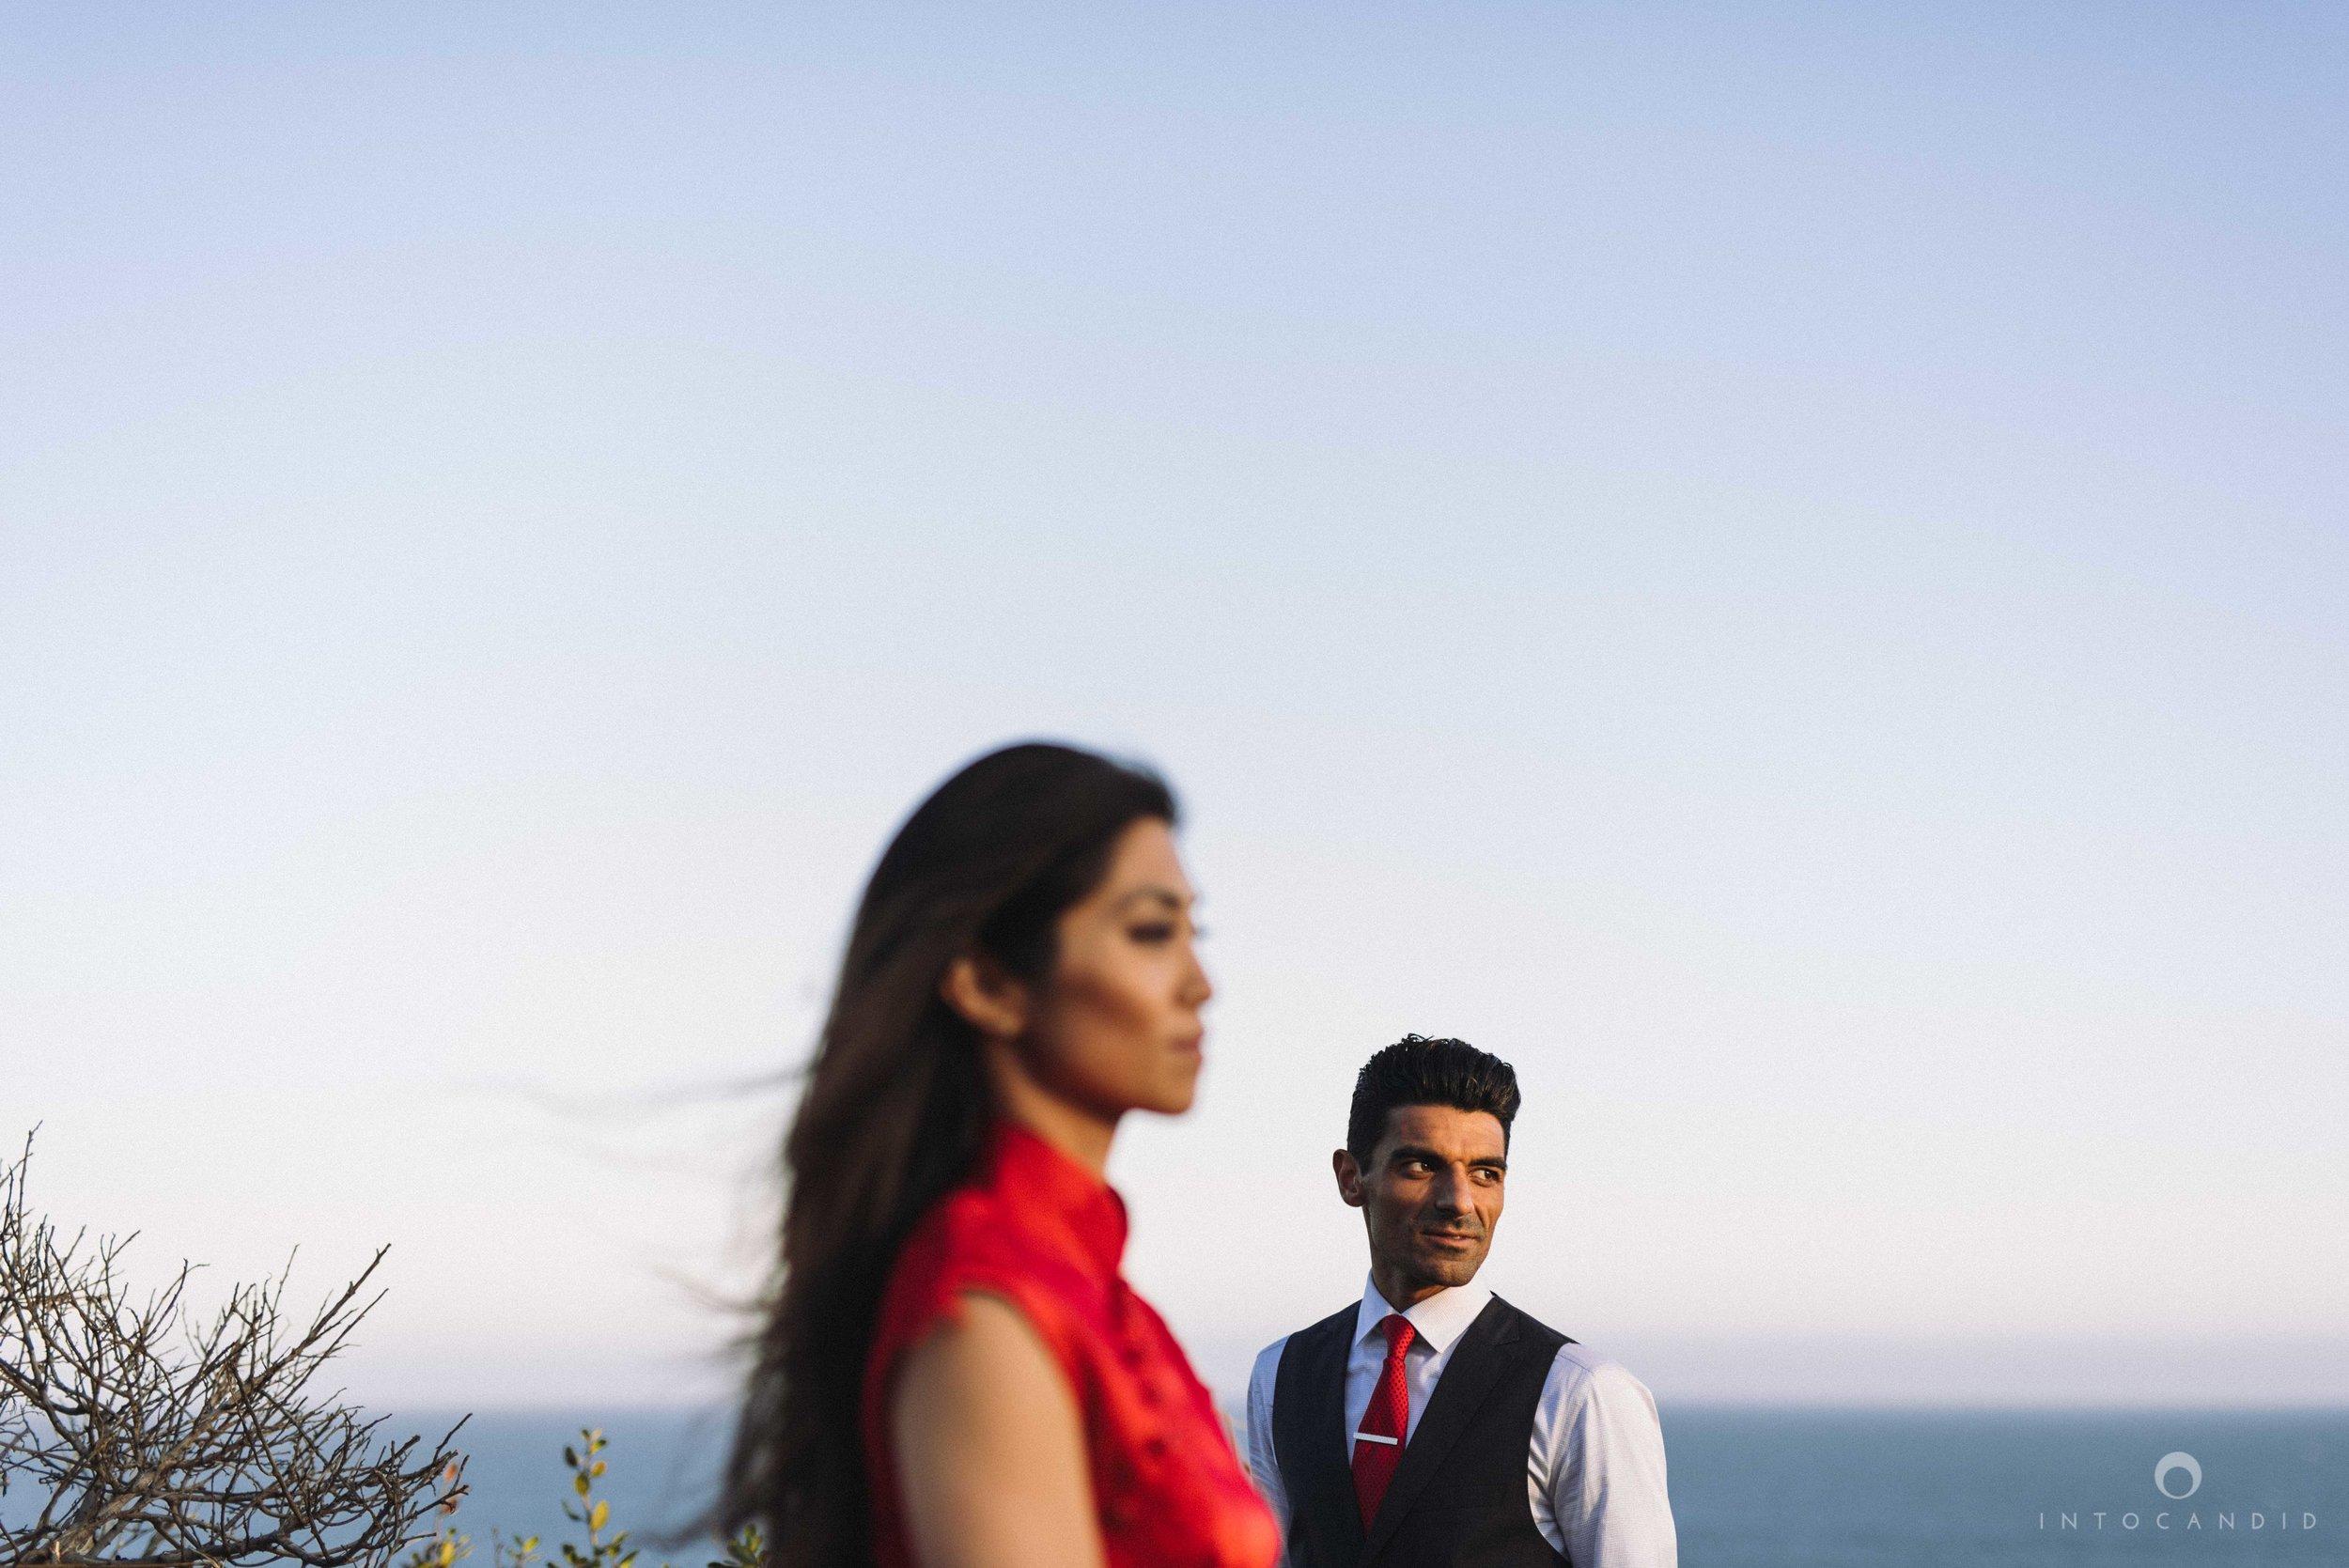 Malibu_California_Engagement_Photographer_AS_04.JPG